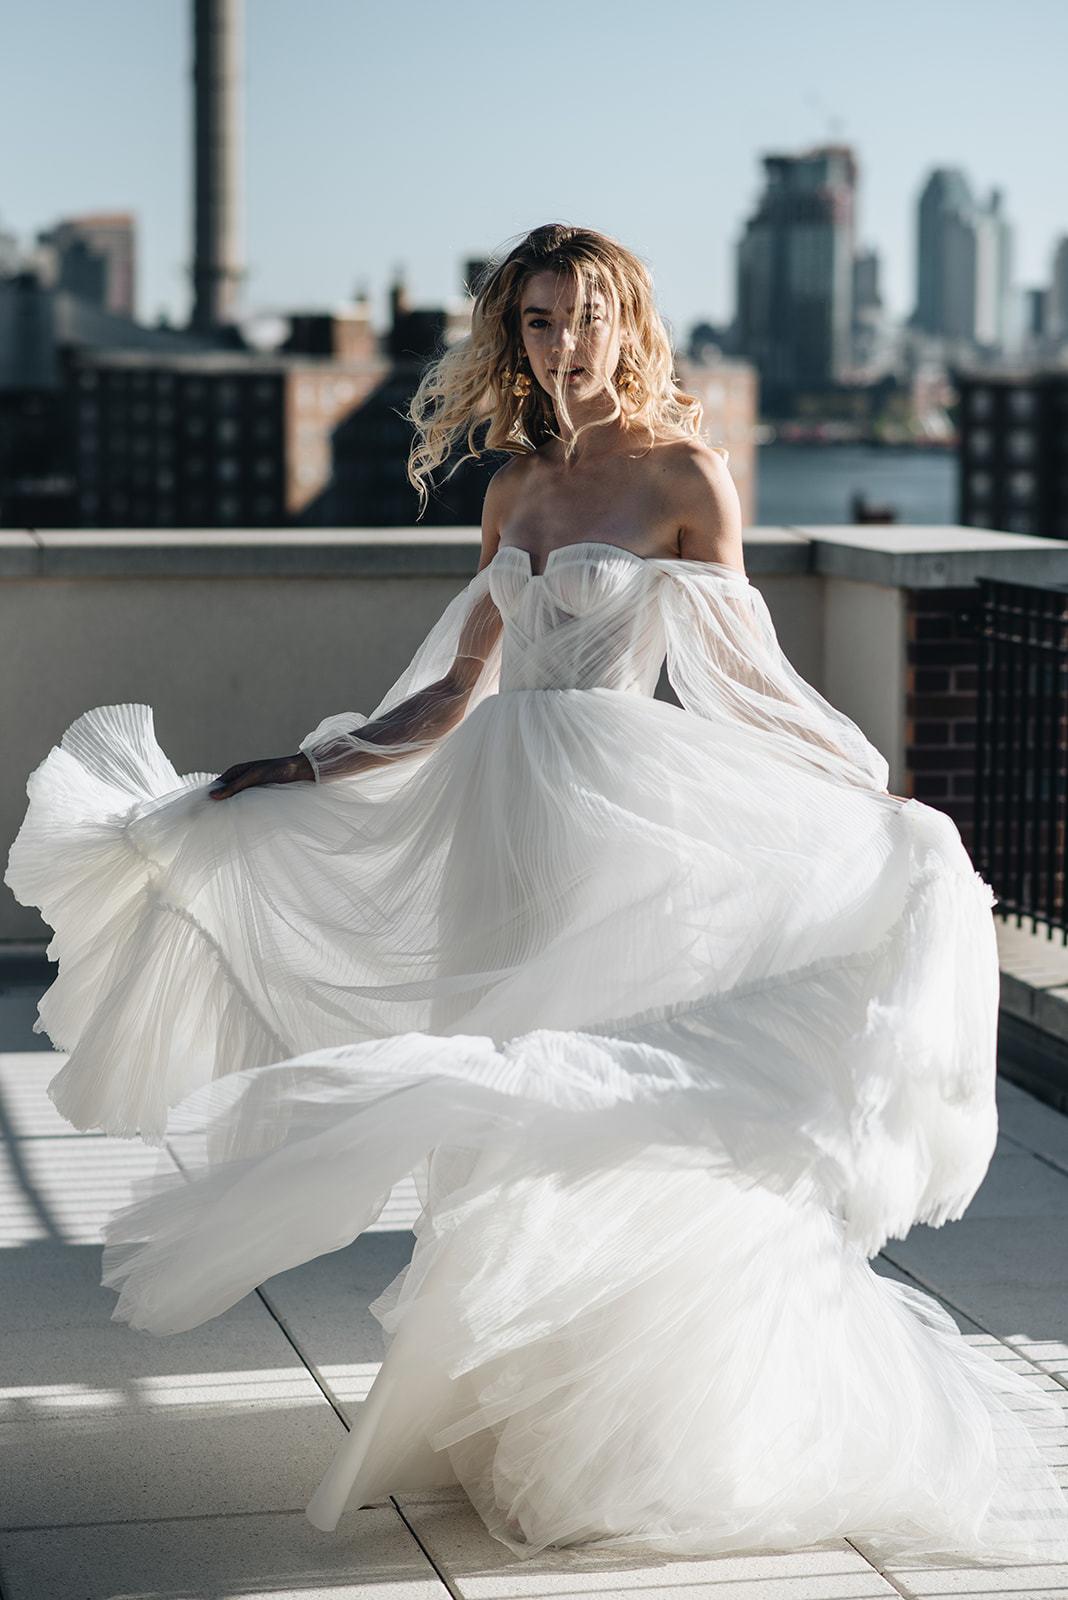 armeria  dress photo